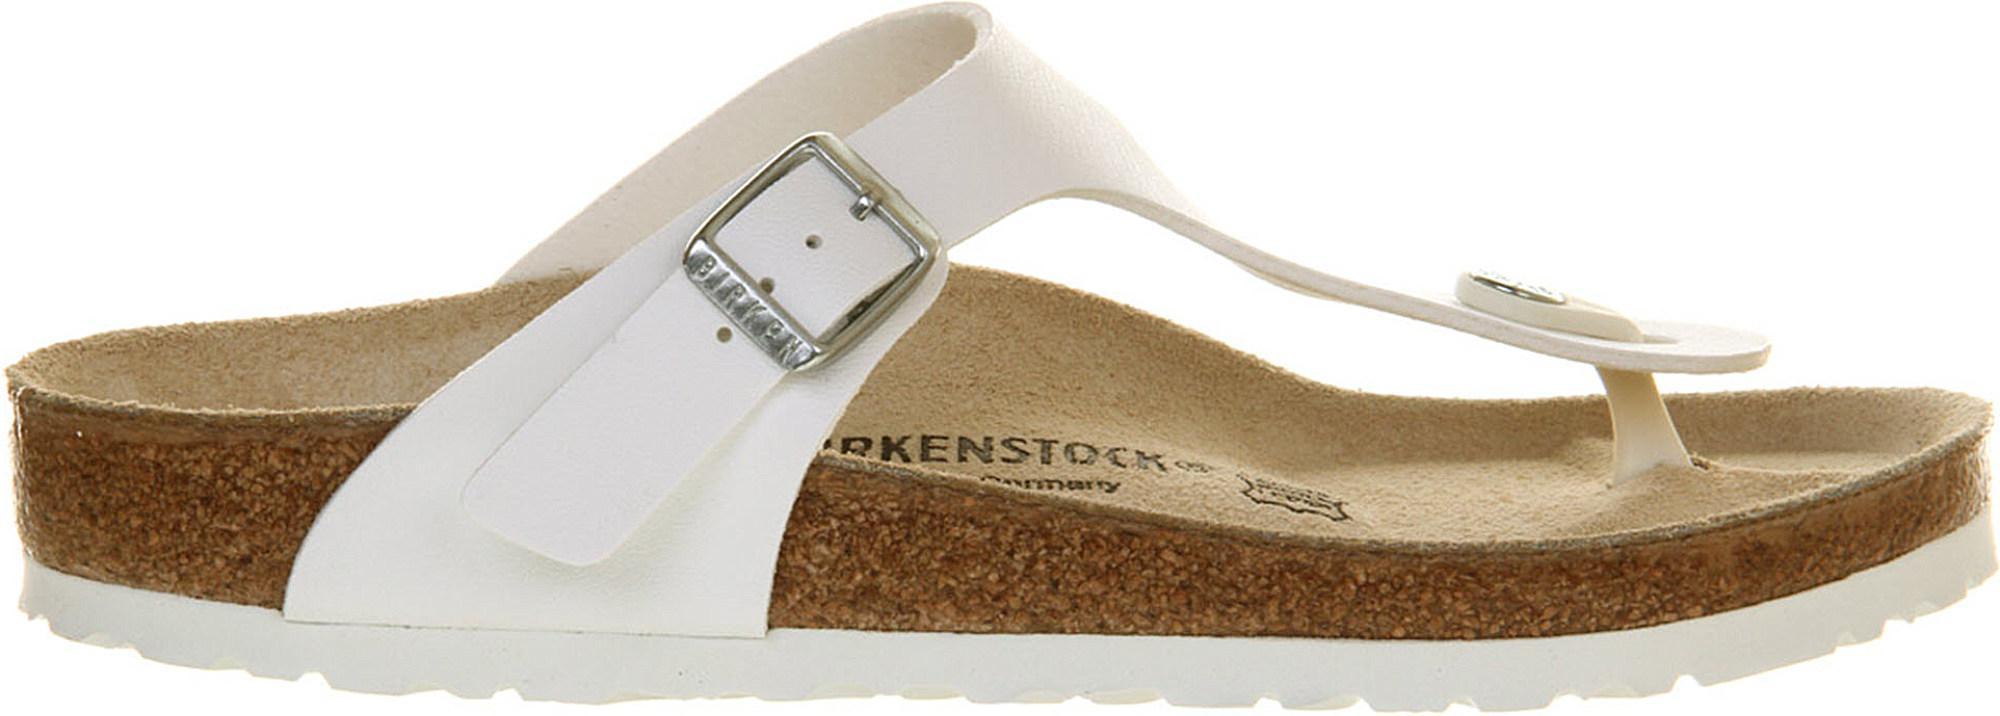 2a1015629e2f33 Birkenstock. Women s White Ramses Faux-leather Sandals